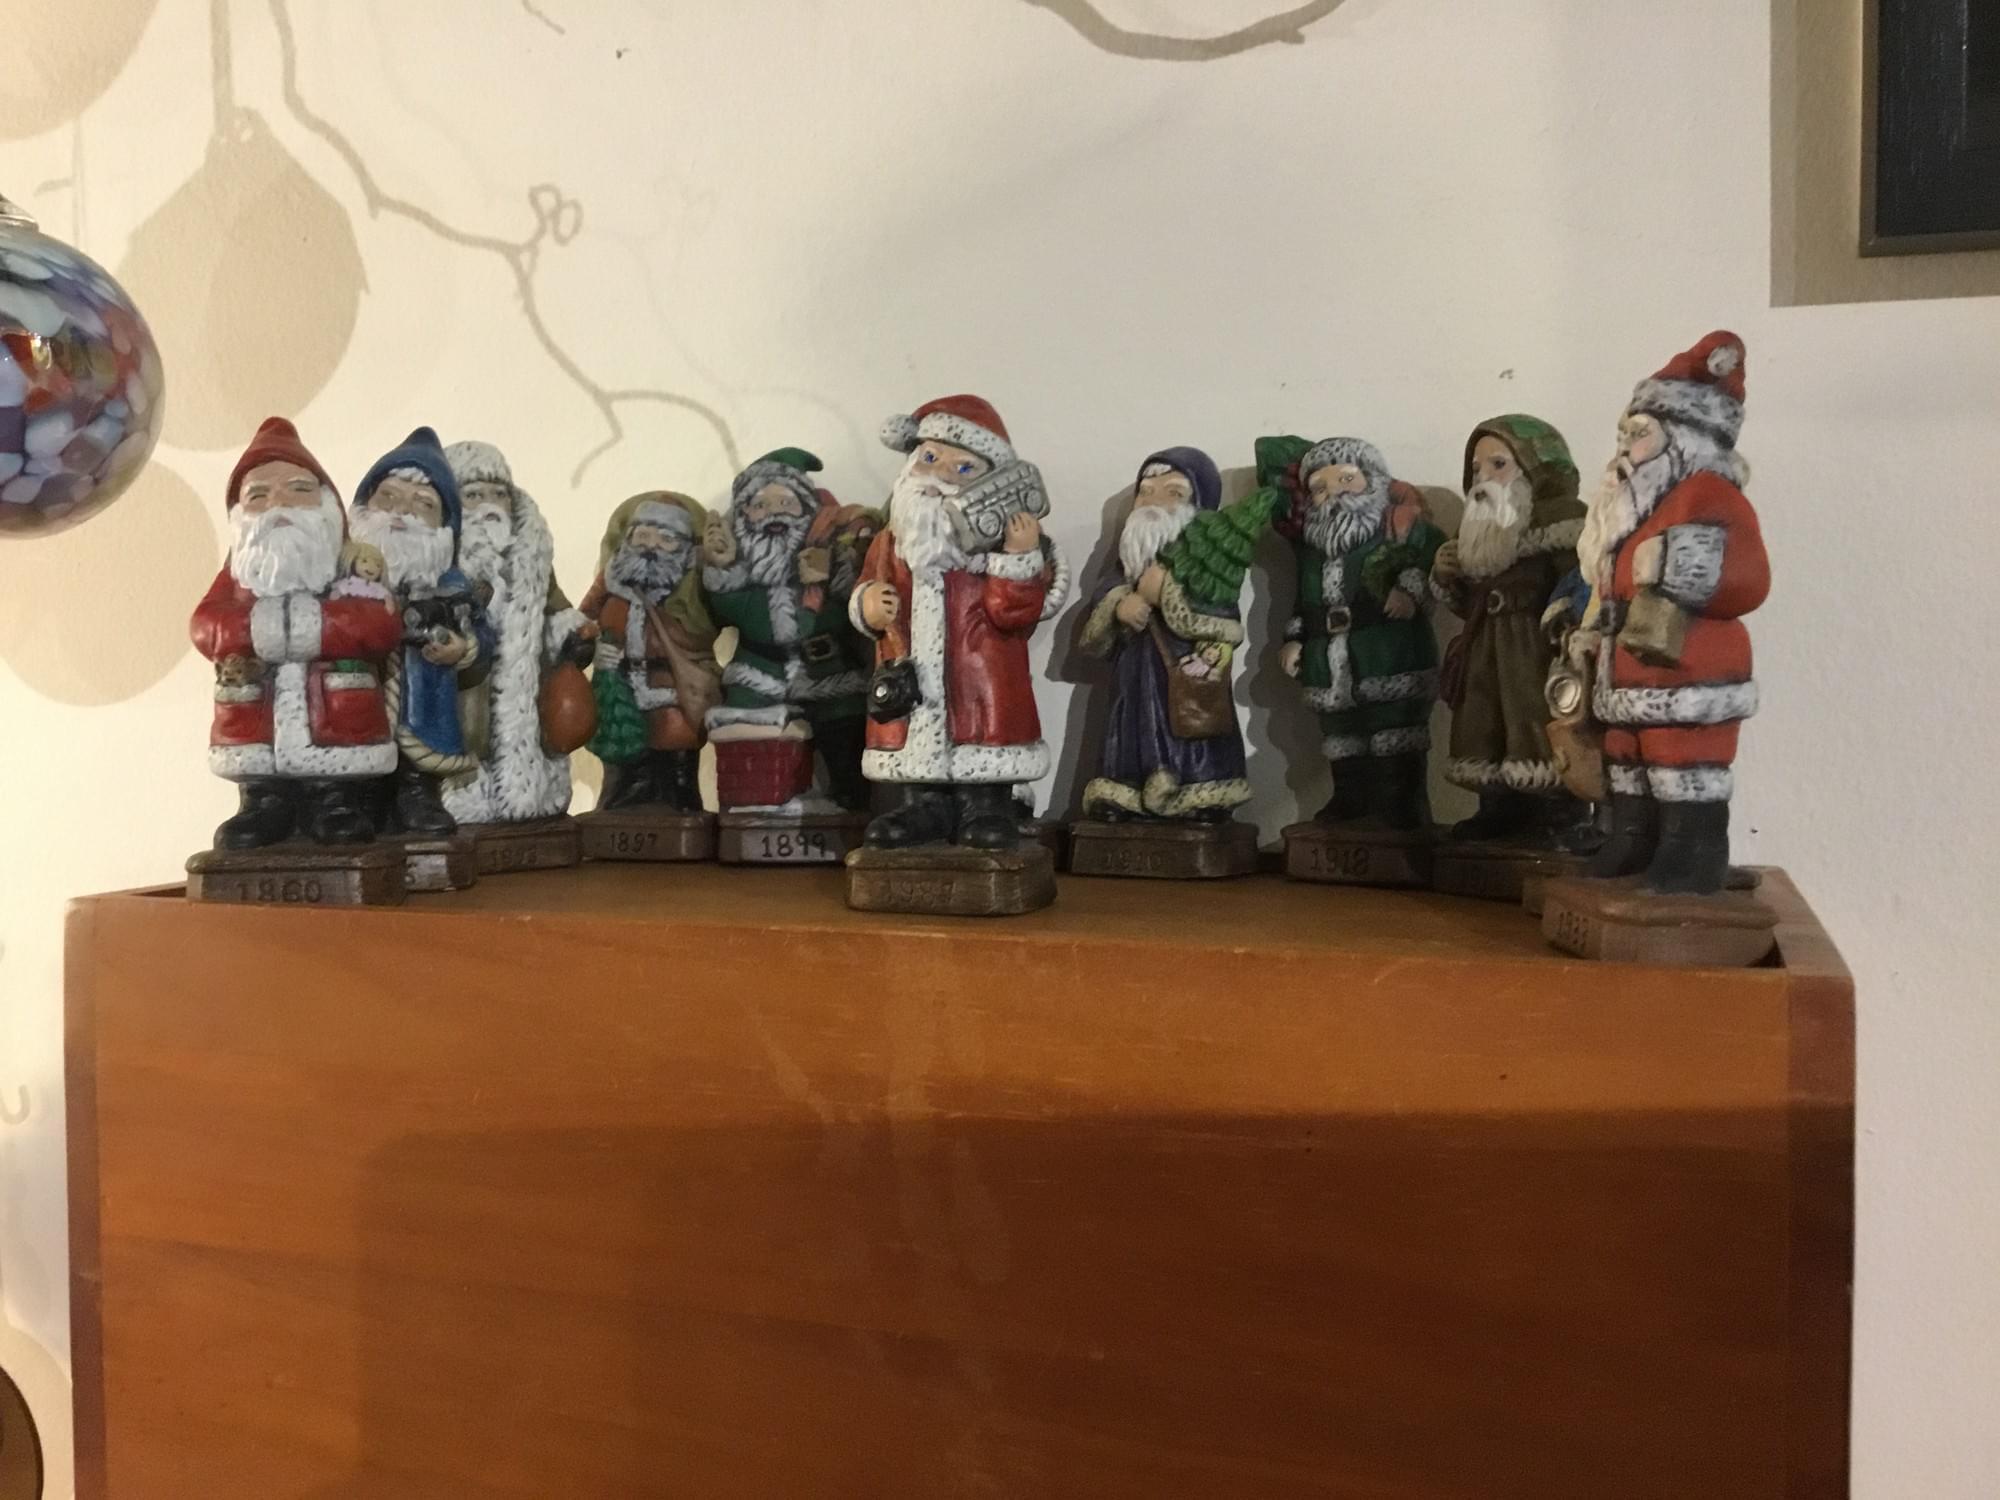 Janis' Santa's